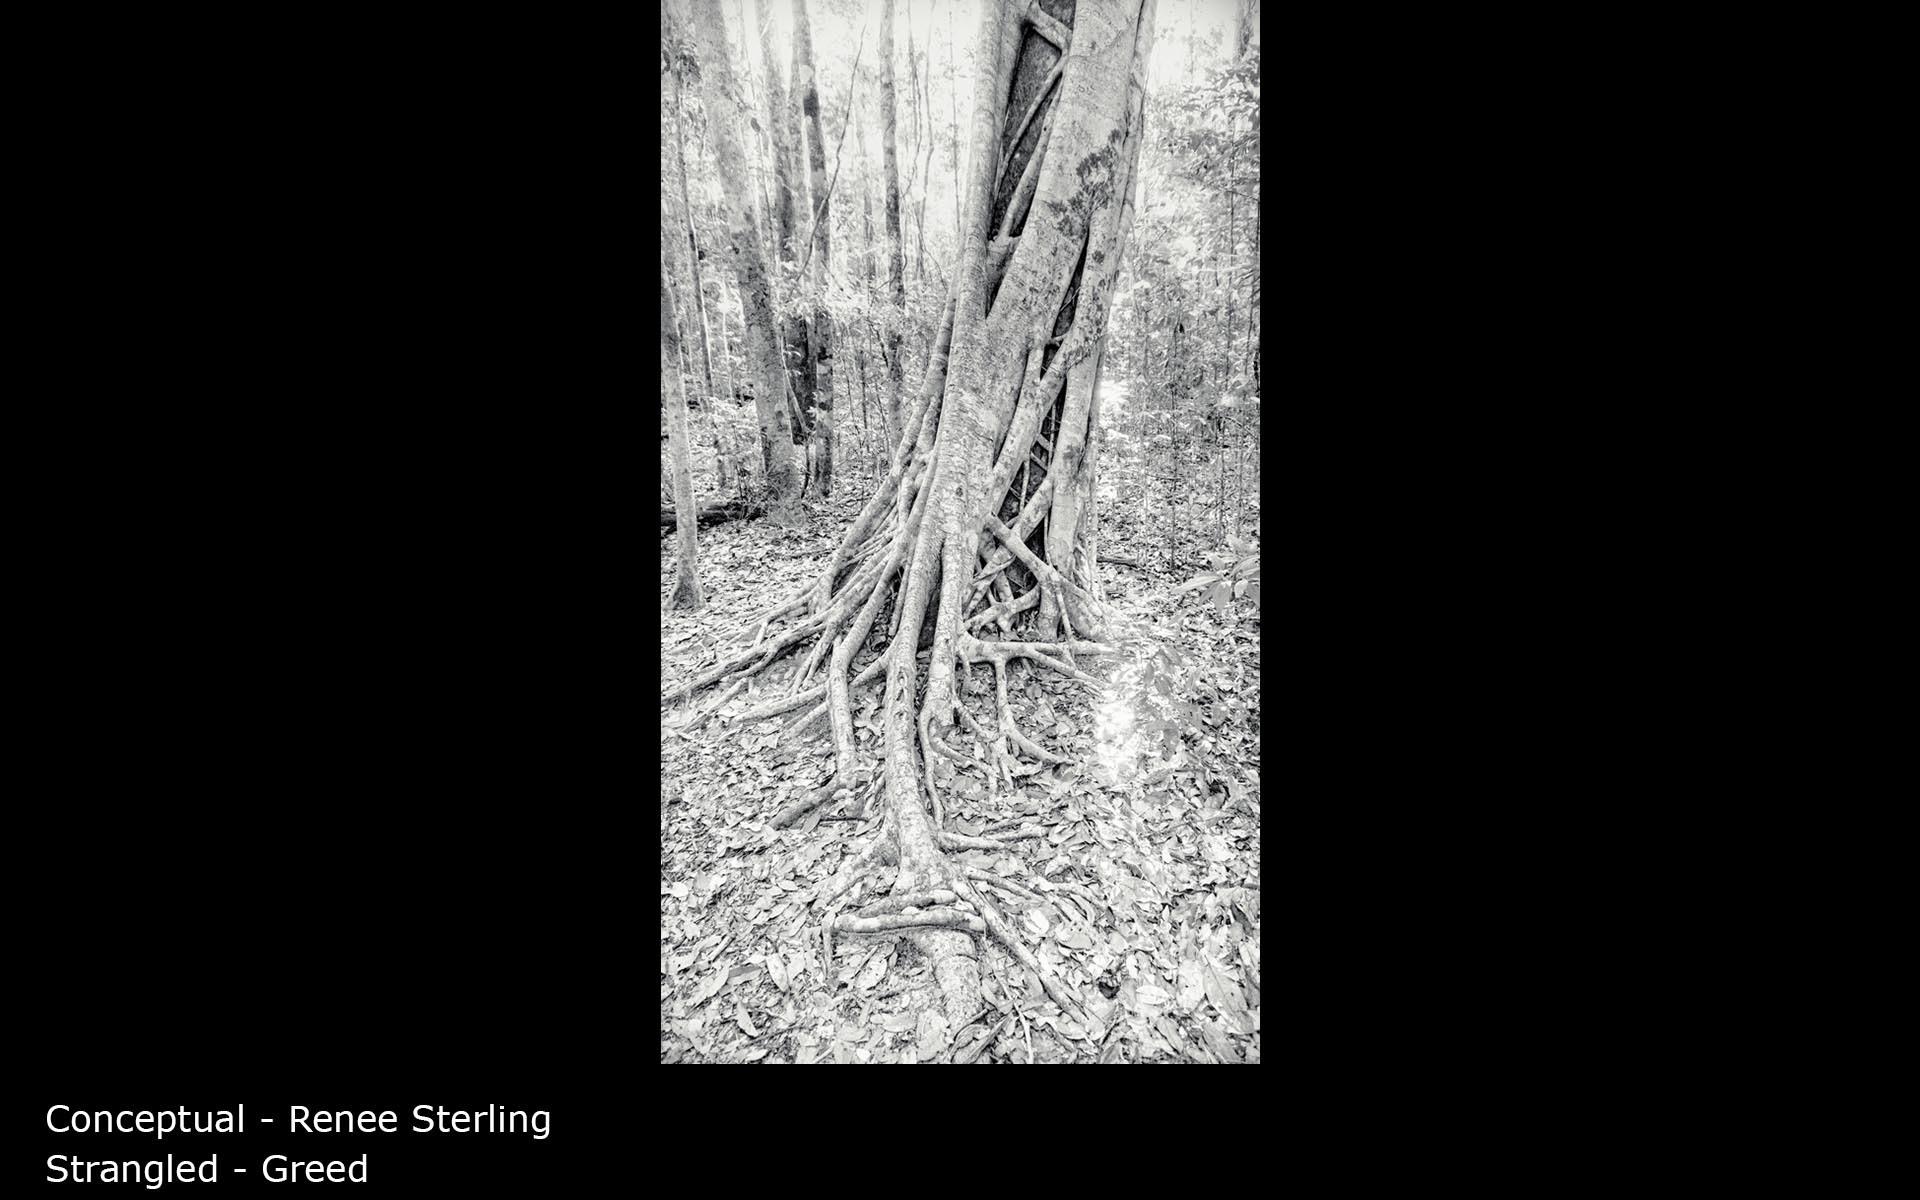 Strangled - Greed - Renee Sterling